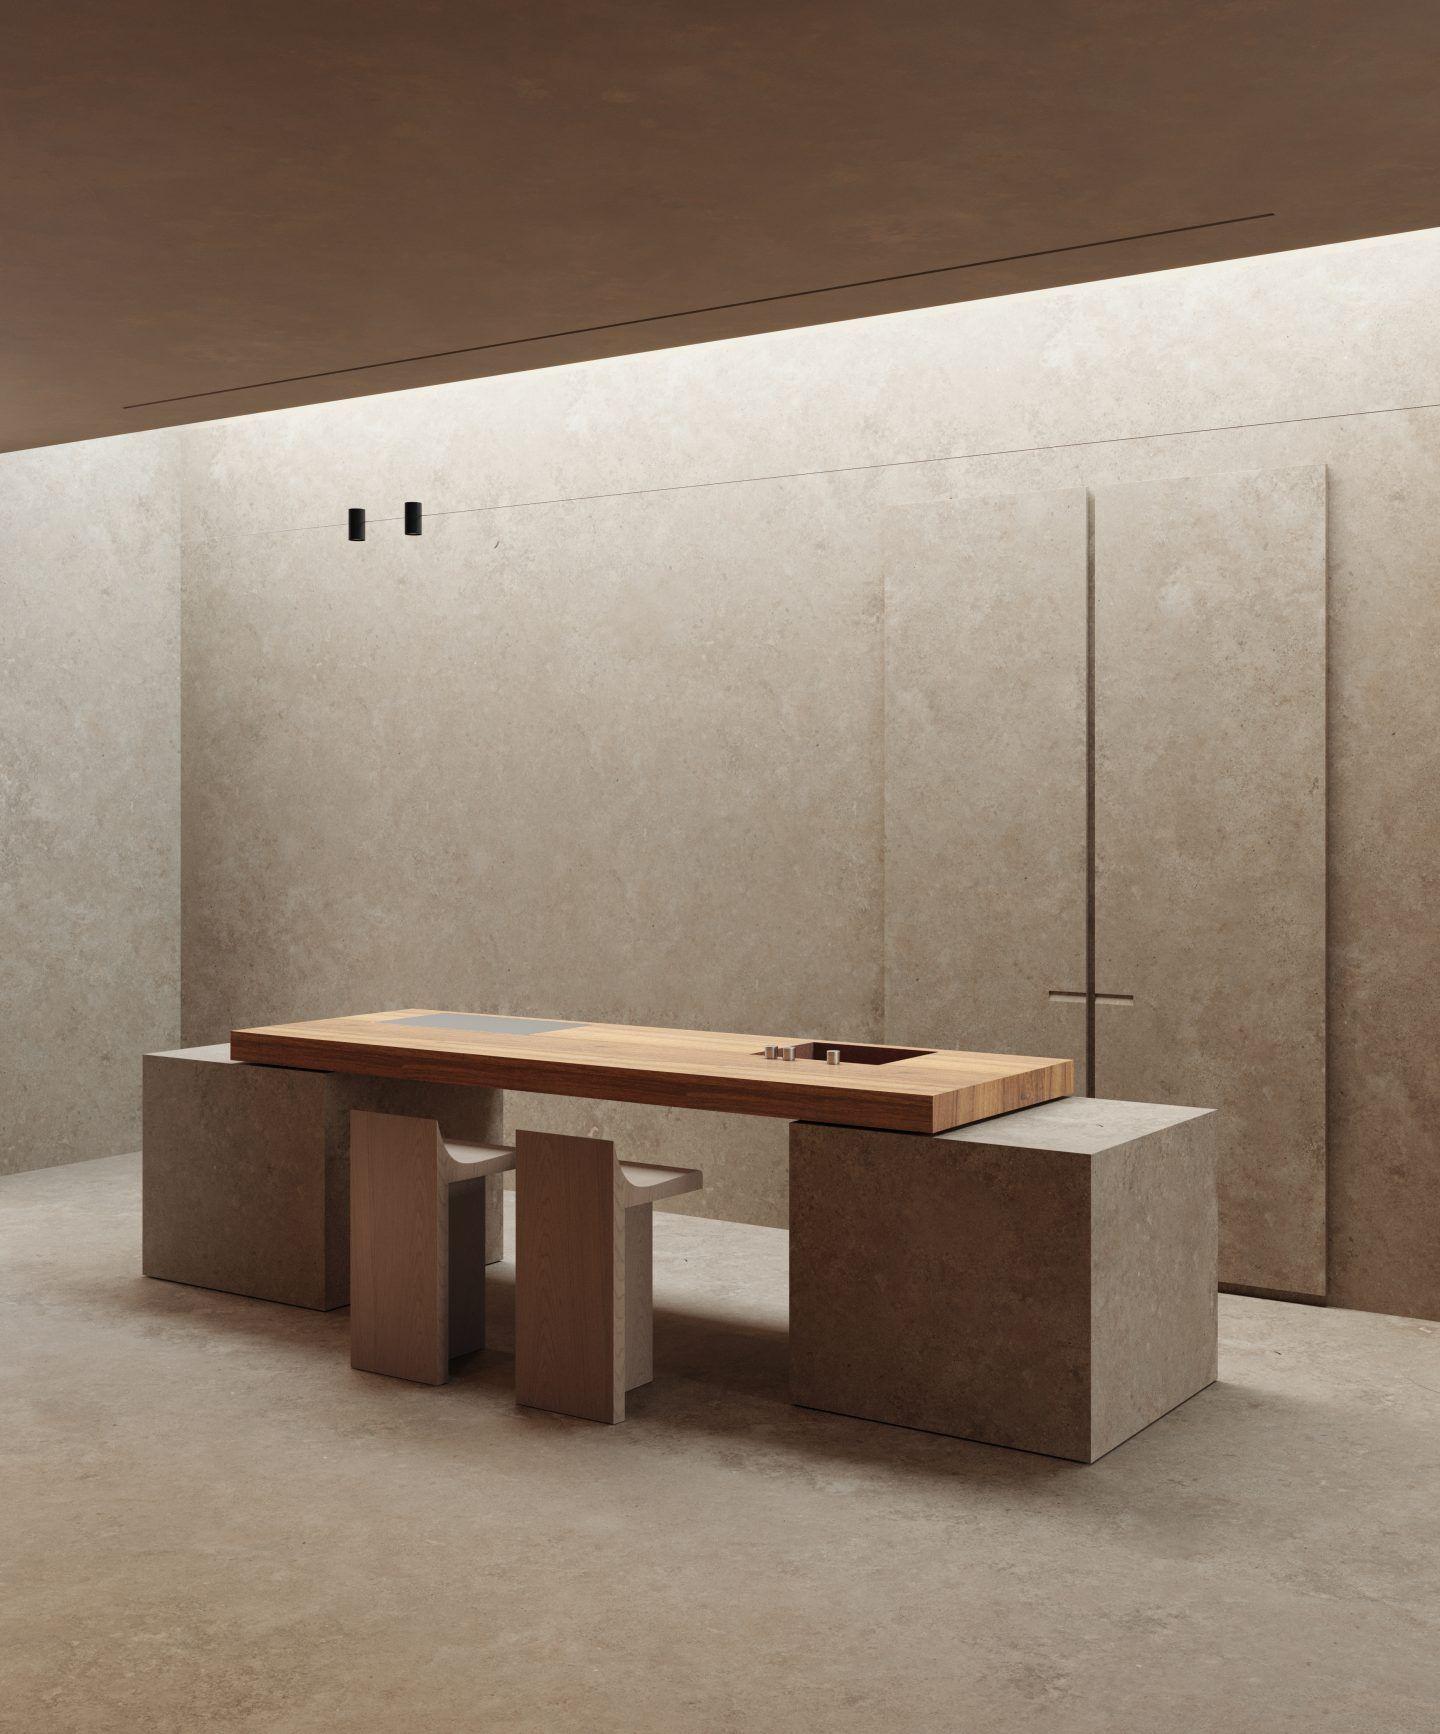 IGNANT-Design-BeachHotelOdessa-5